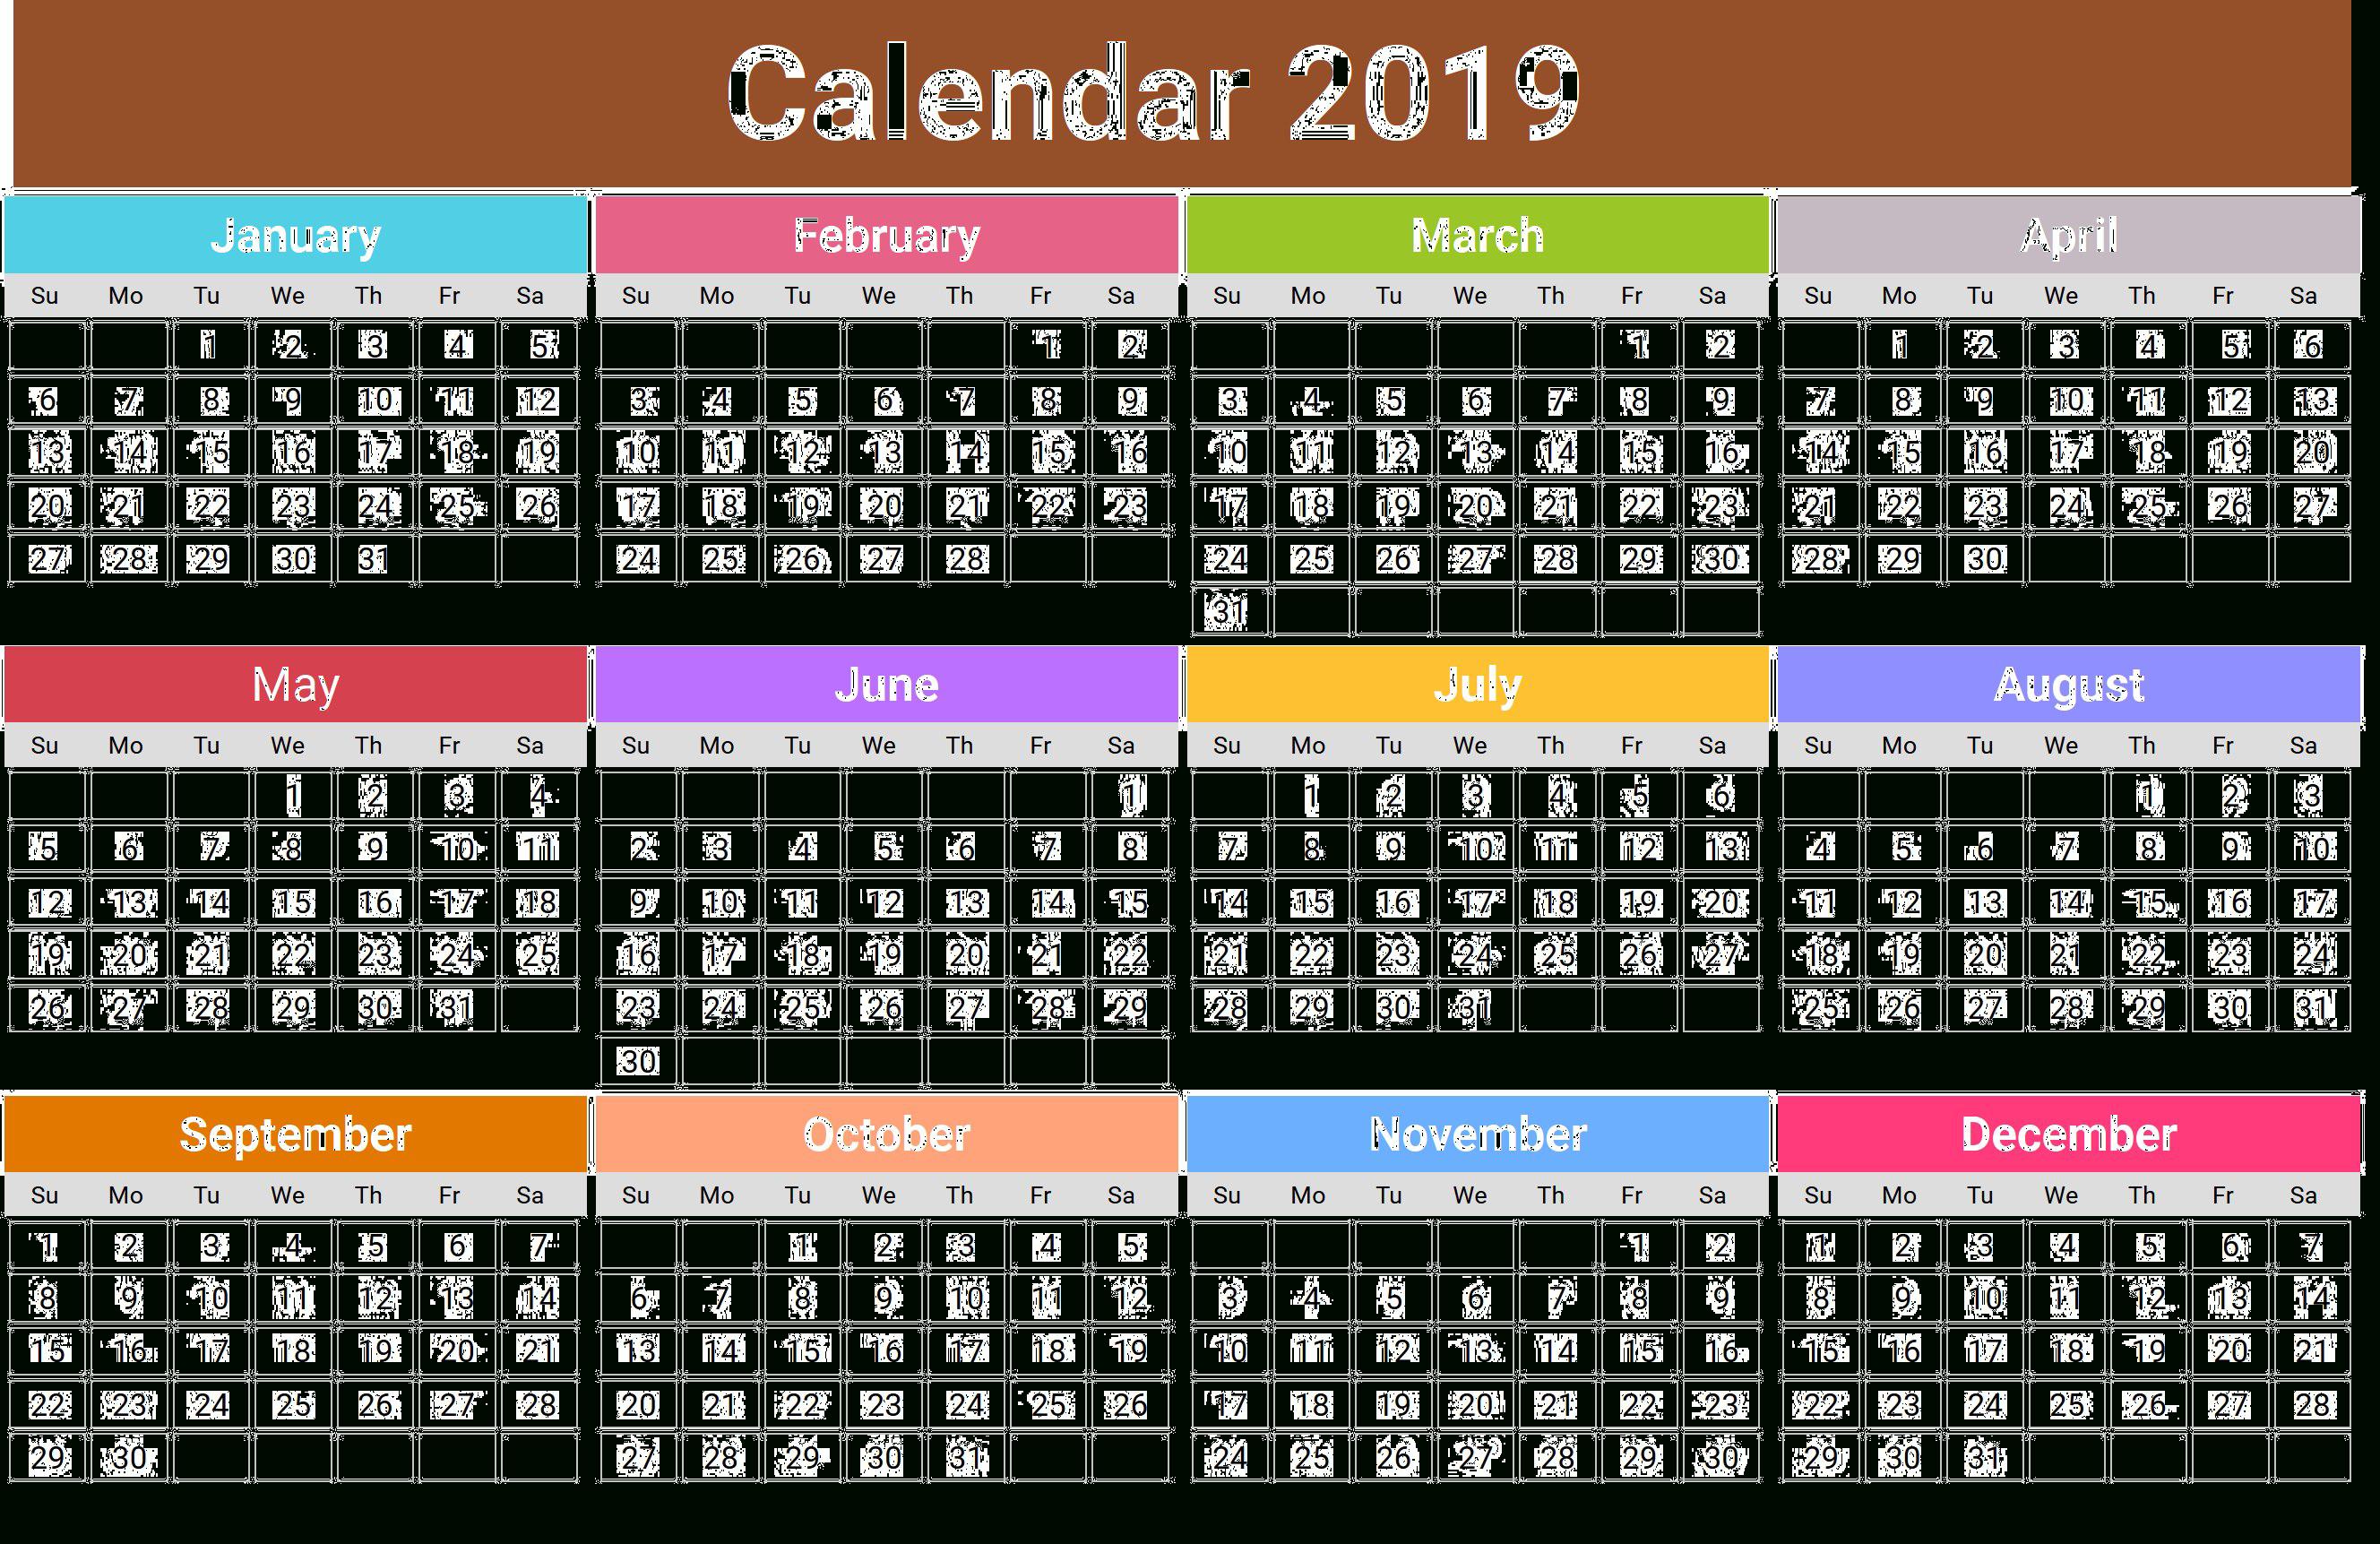 2019 Calendar Png Transparent Images   Png All Calendar 2019 Images